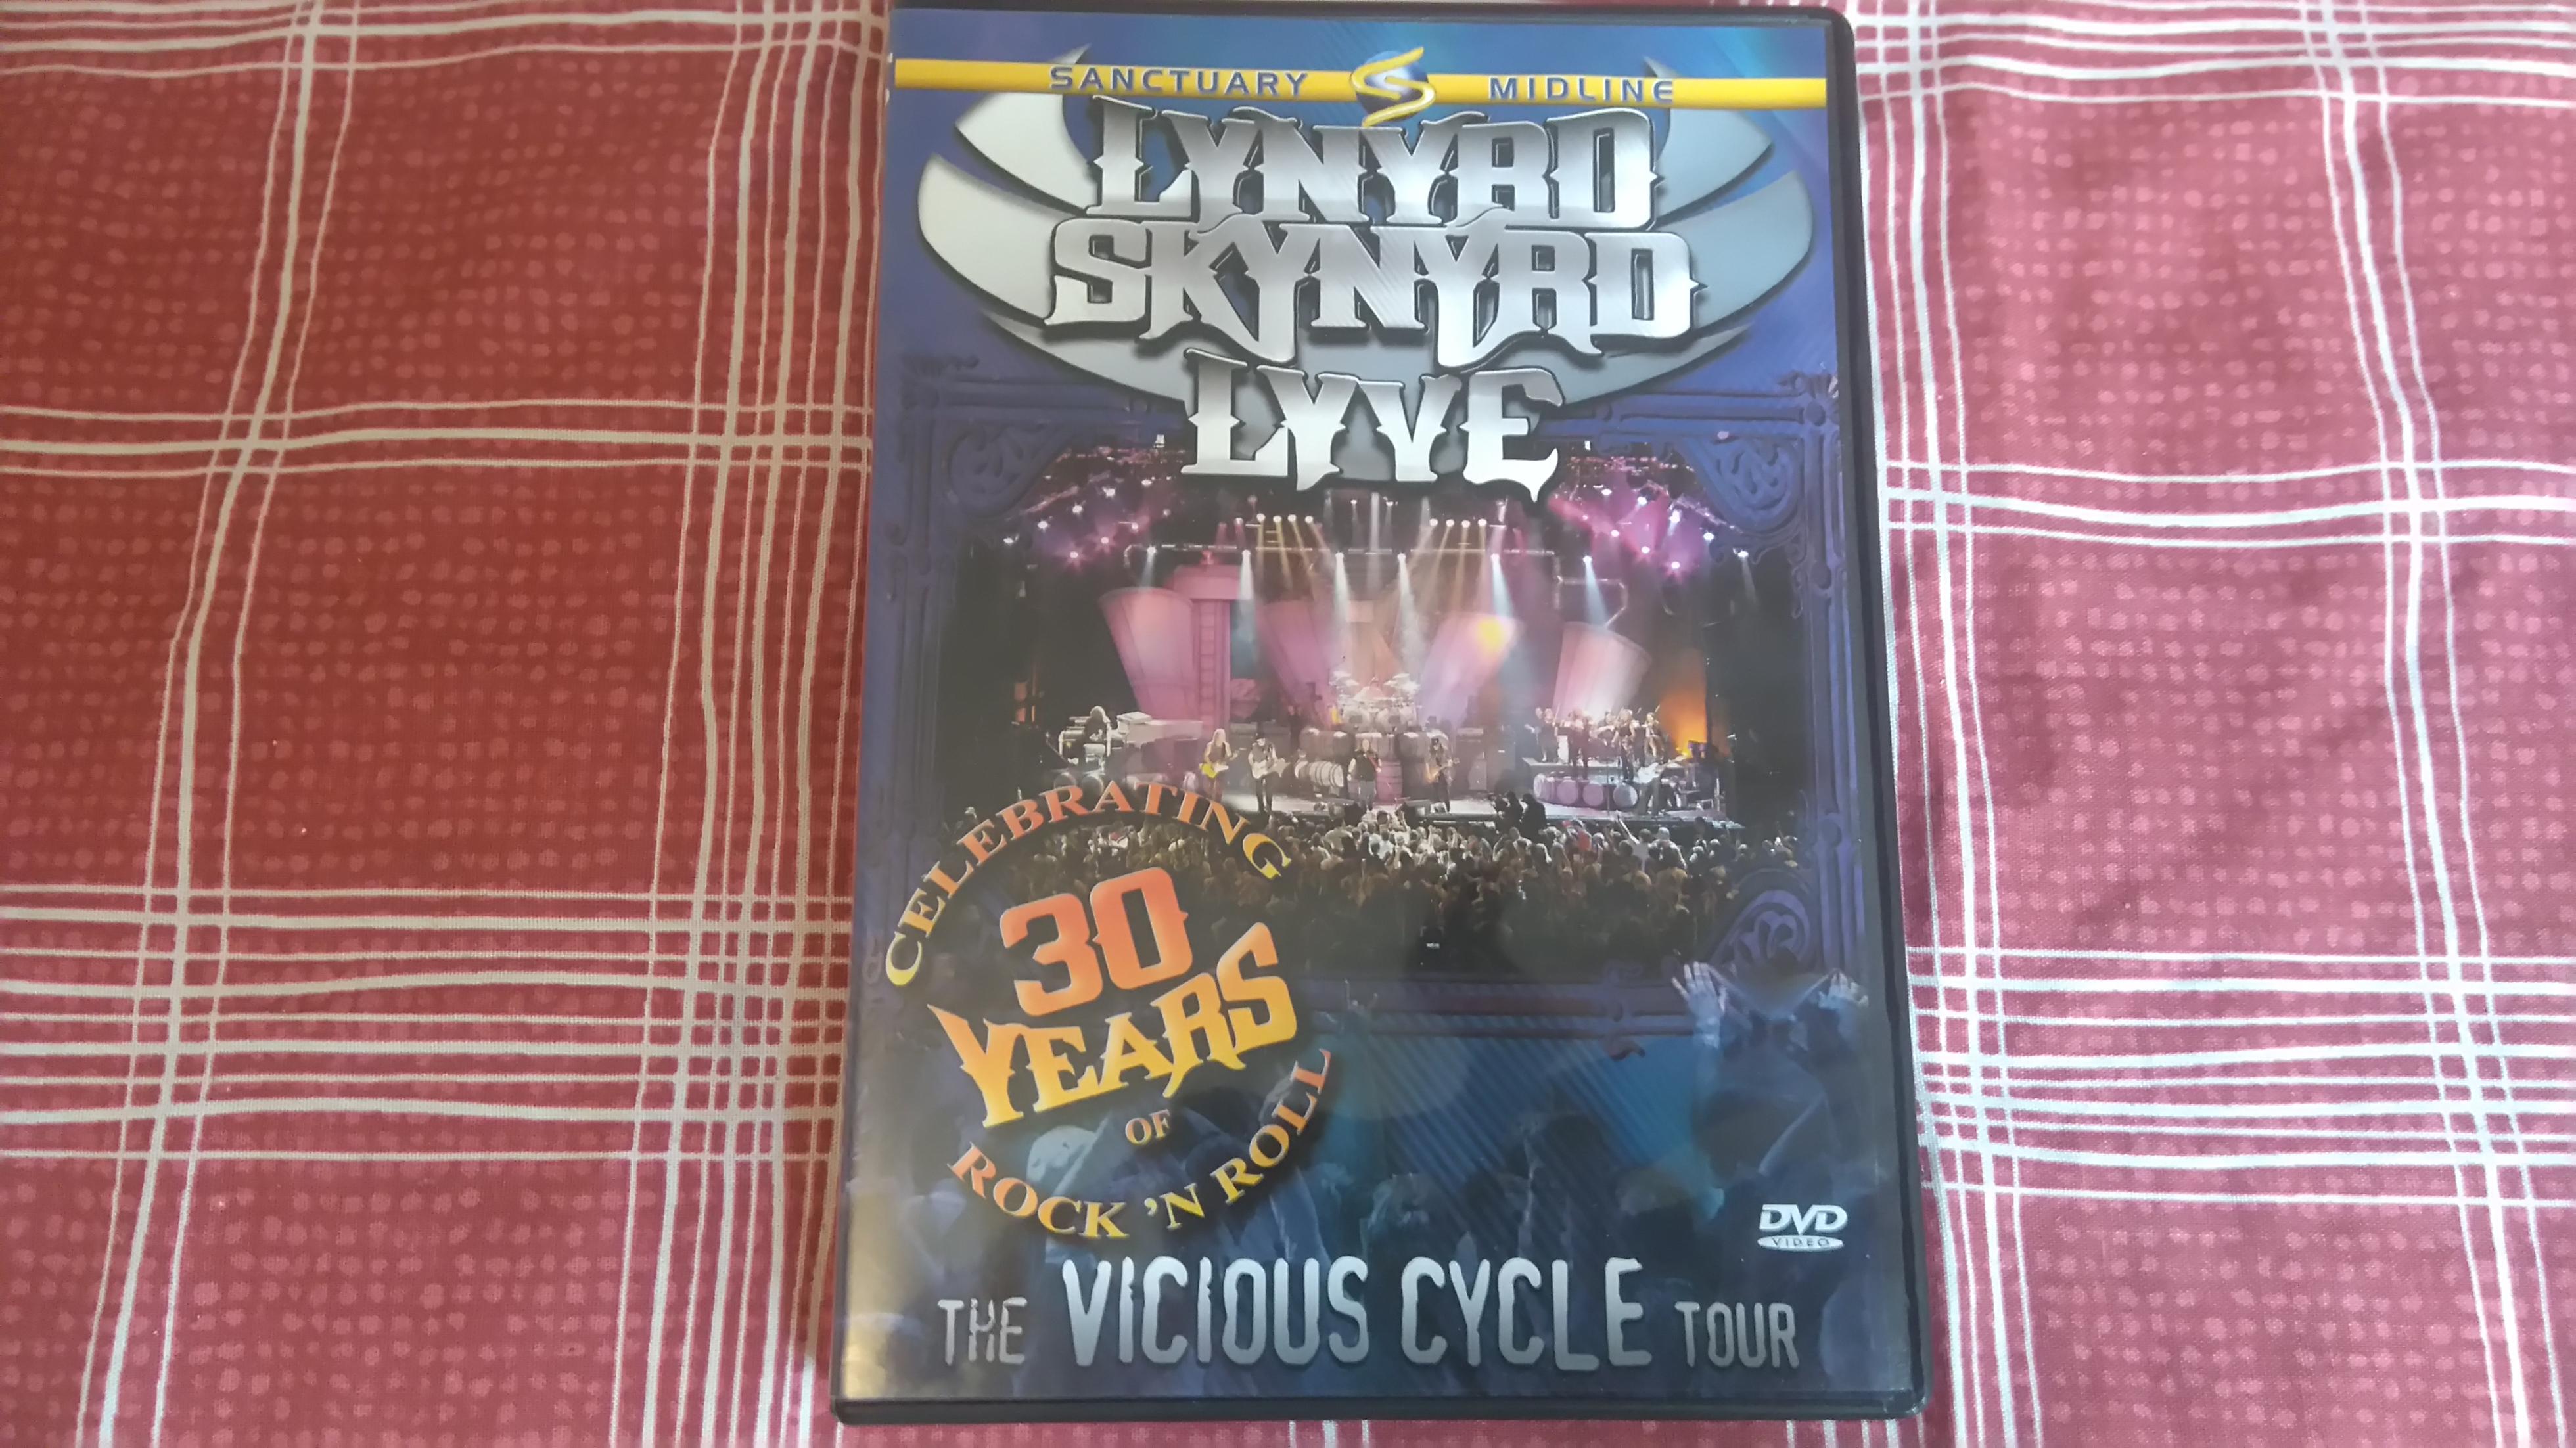 Lynyrd skynrd dvd.JPG